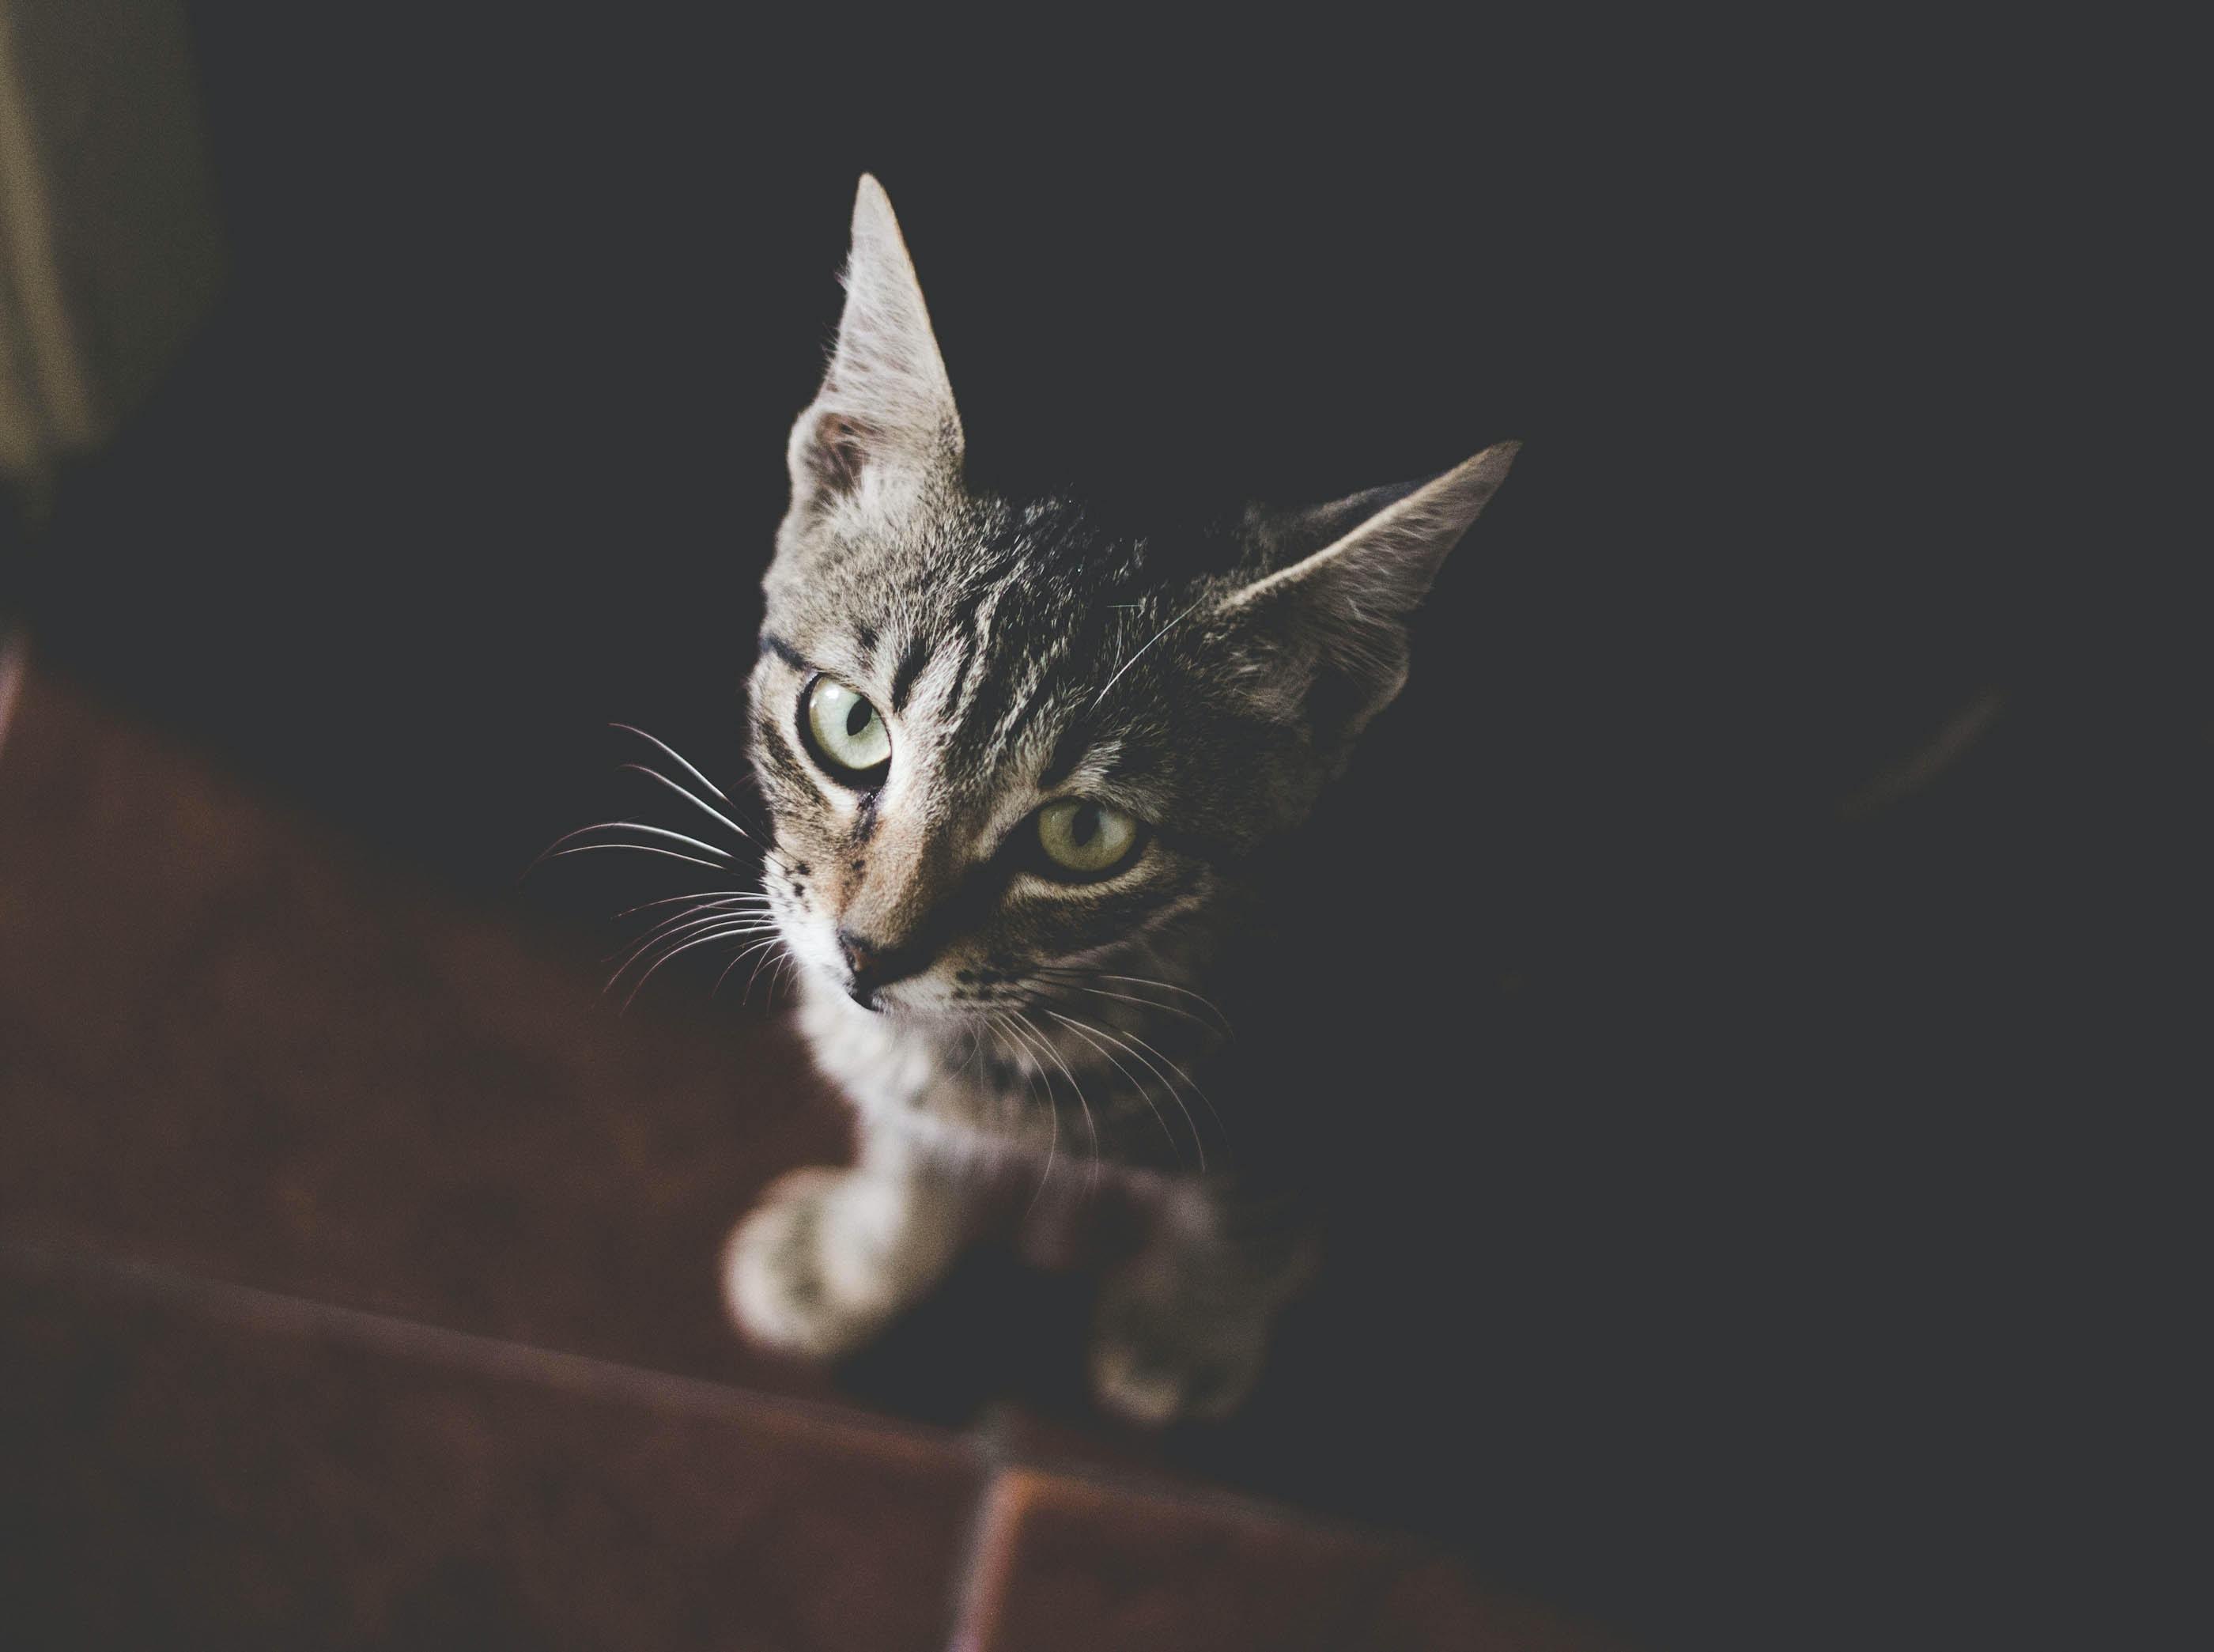 A dim high-angle shot of a tabby cat